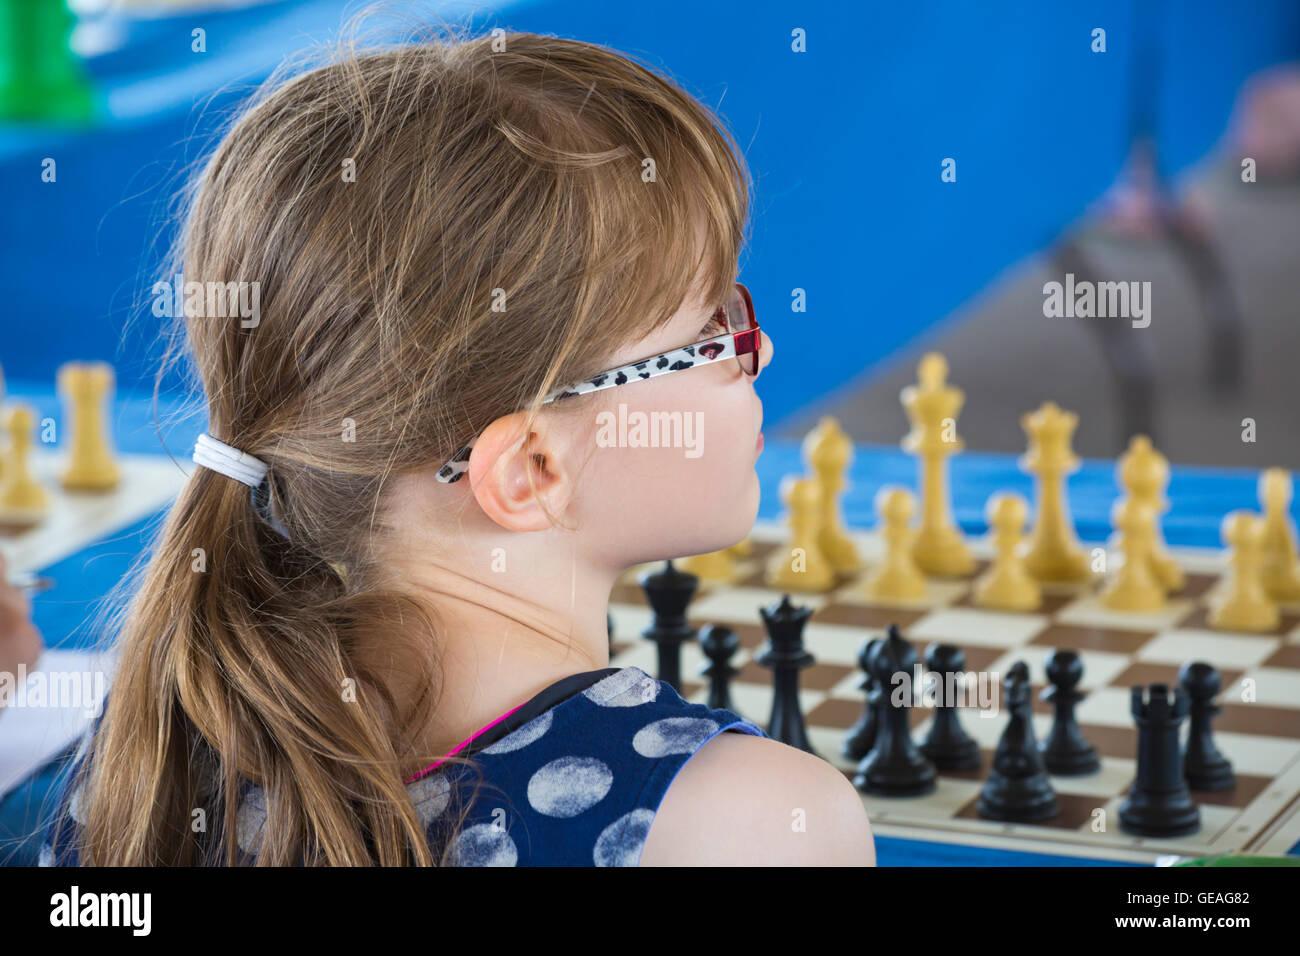 Move Charity Stockfotos & Move Charity Bilder - Alamy